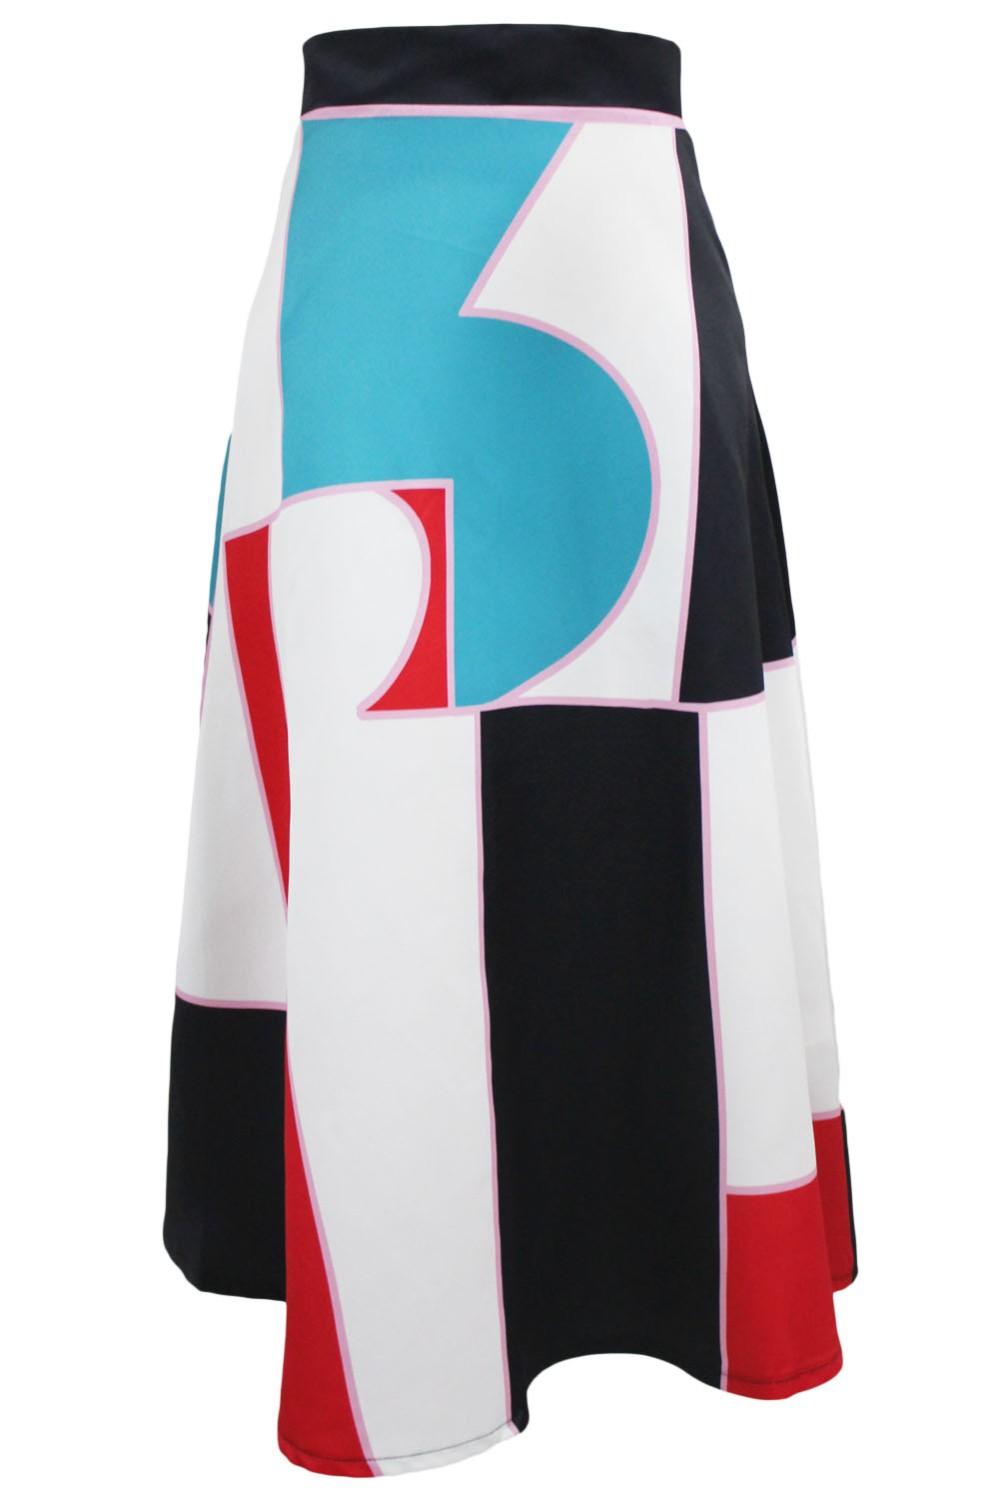 Irregular-Colorblock-Print-High-Waist-Maxi-Skirt-LC65017-22-5